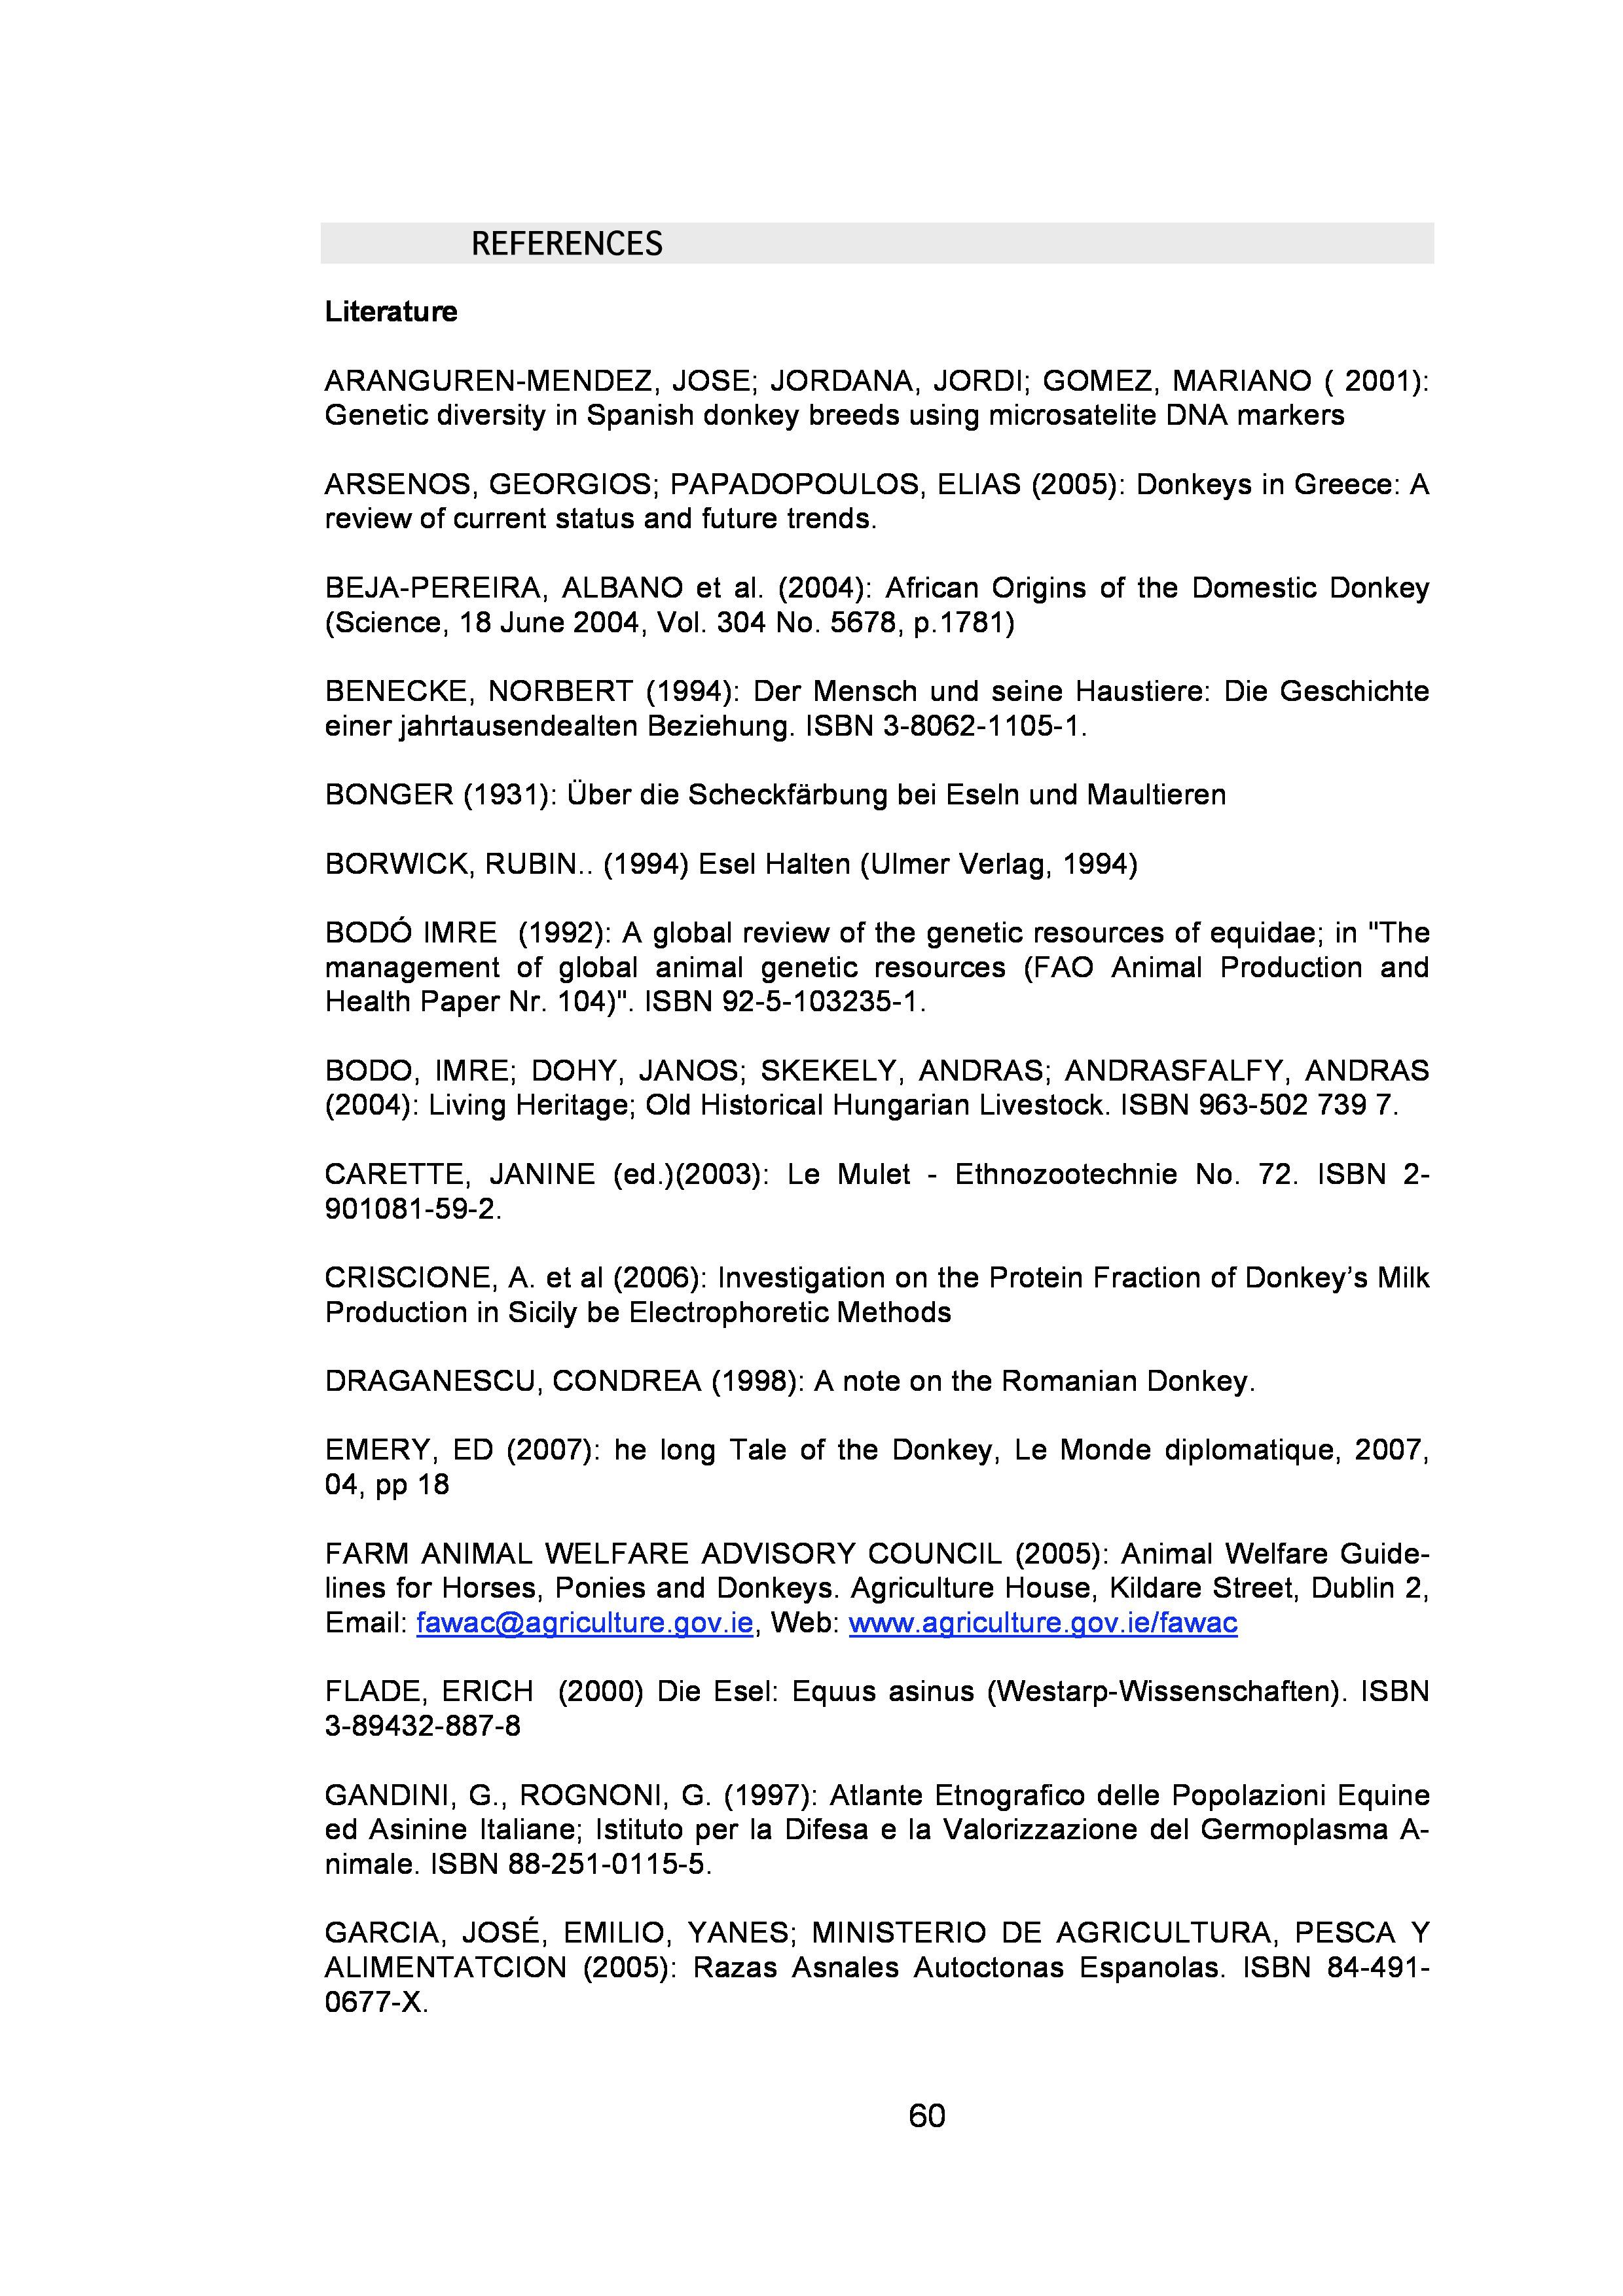 page-59.jpg